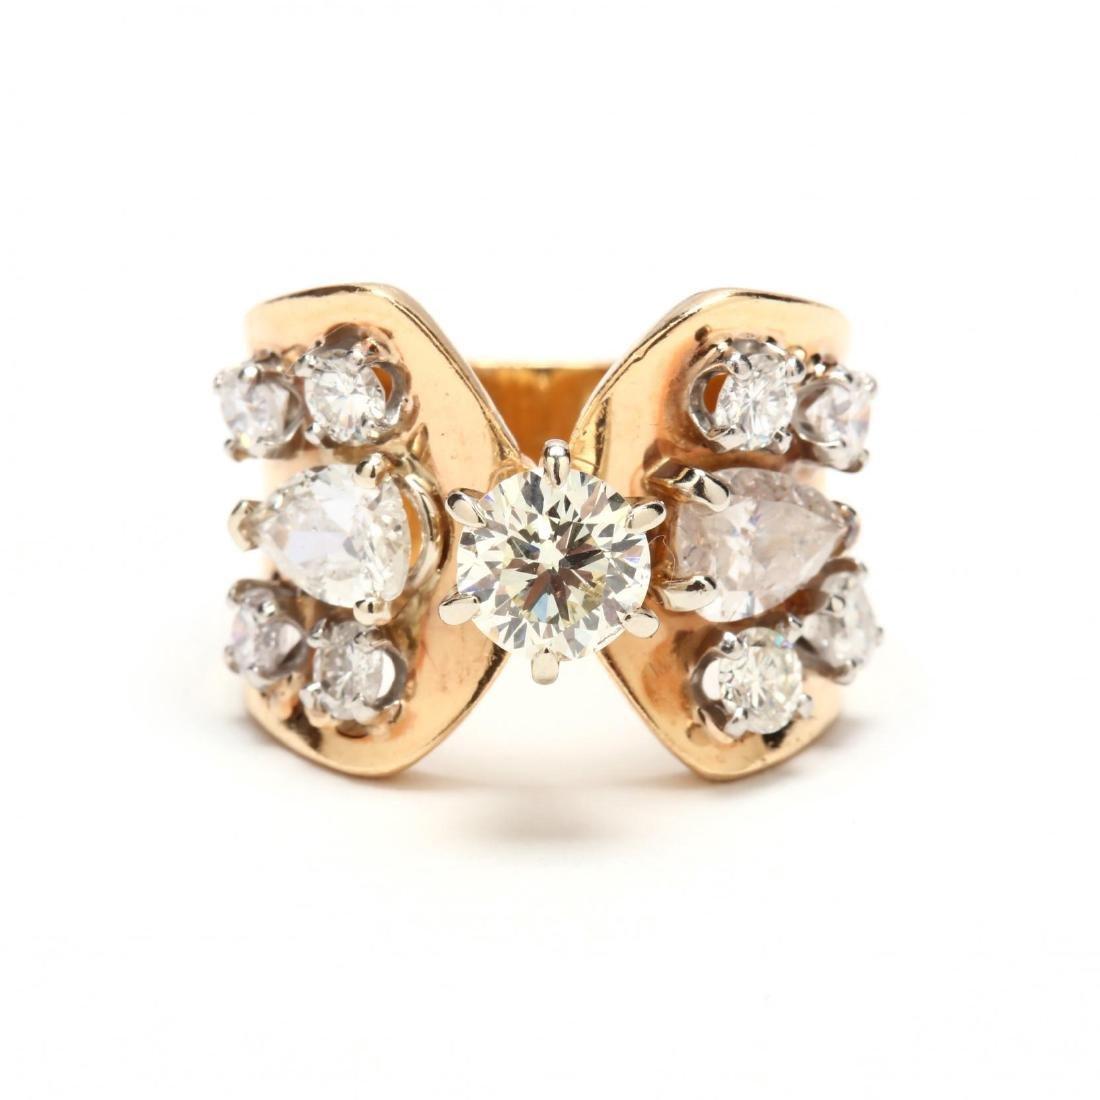 14KT Multi Stone Diamond Ring